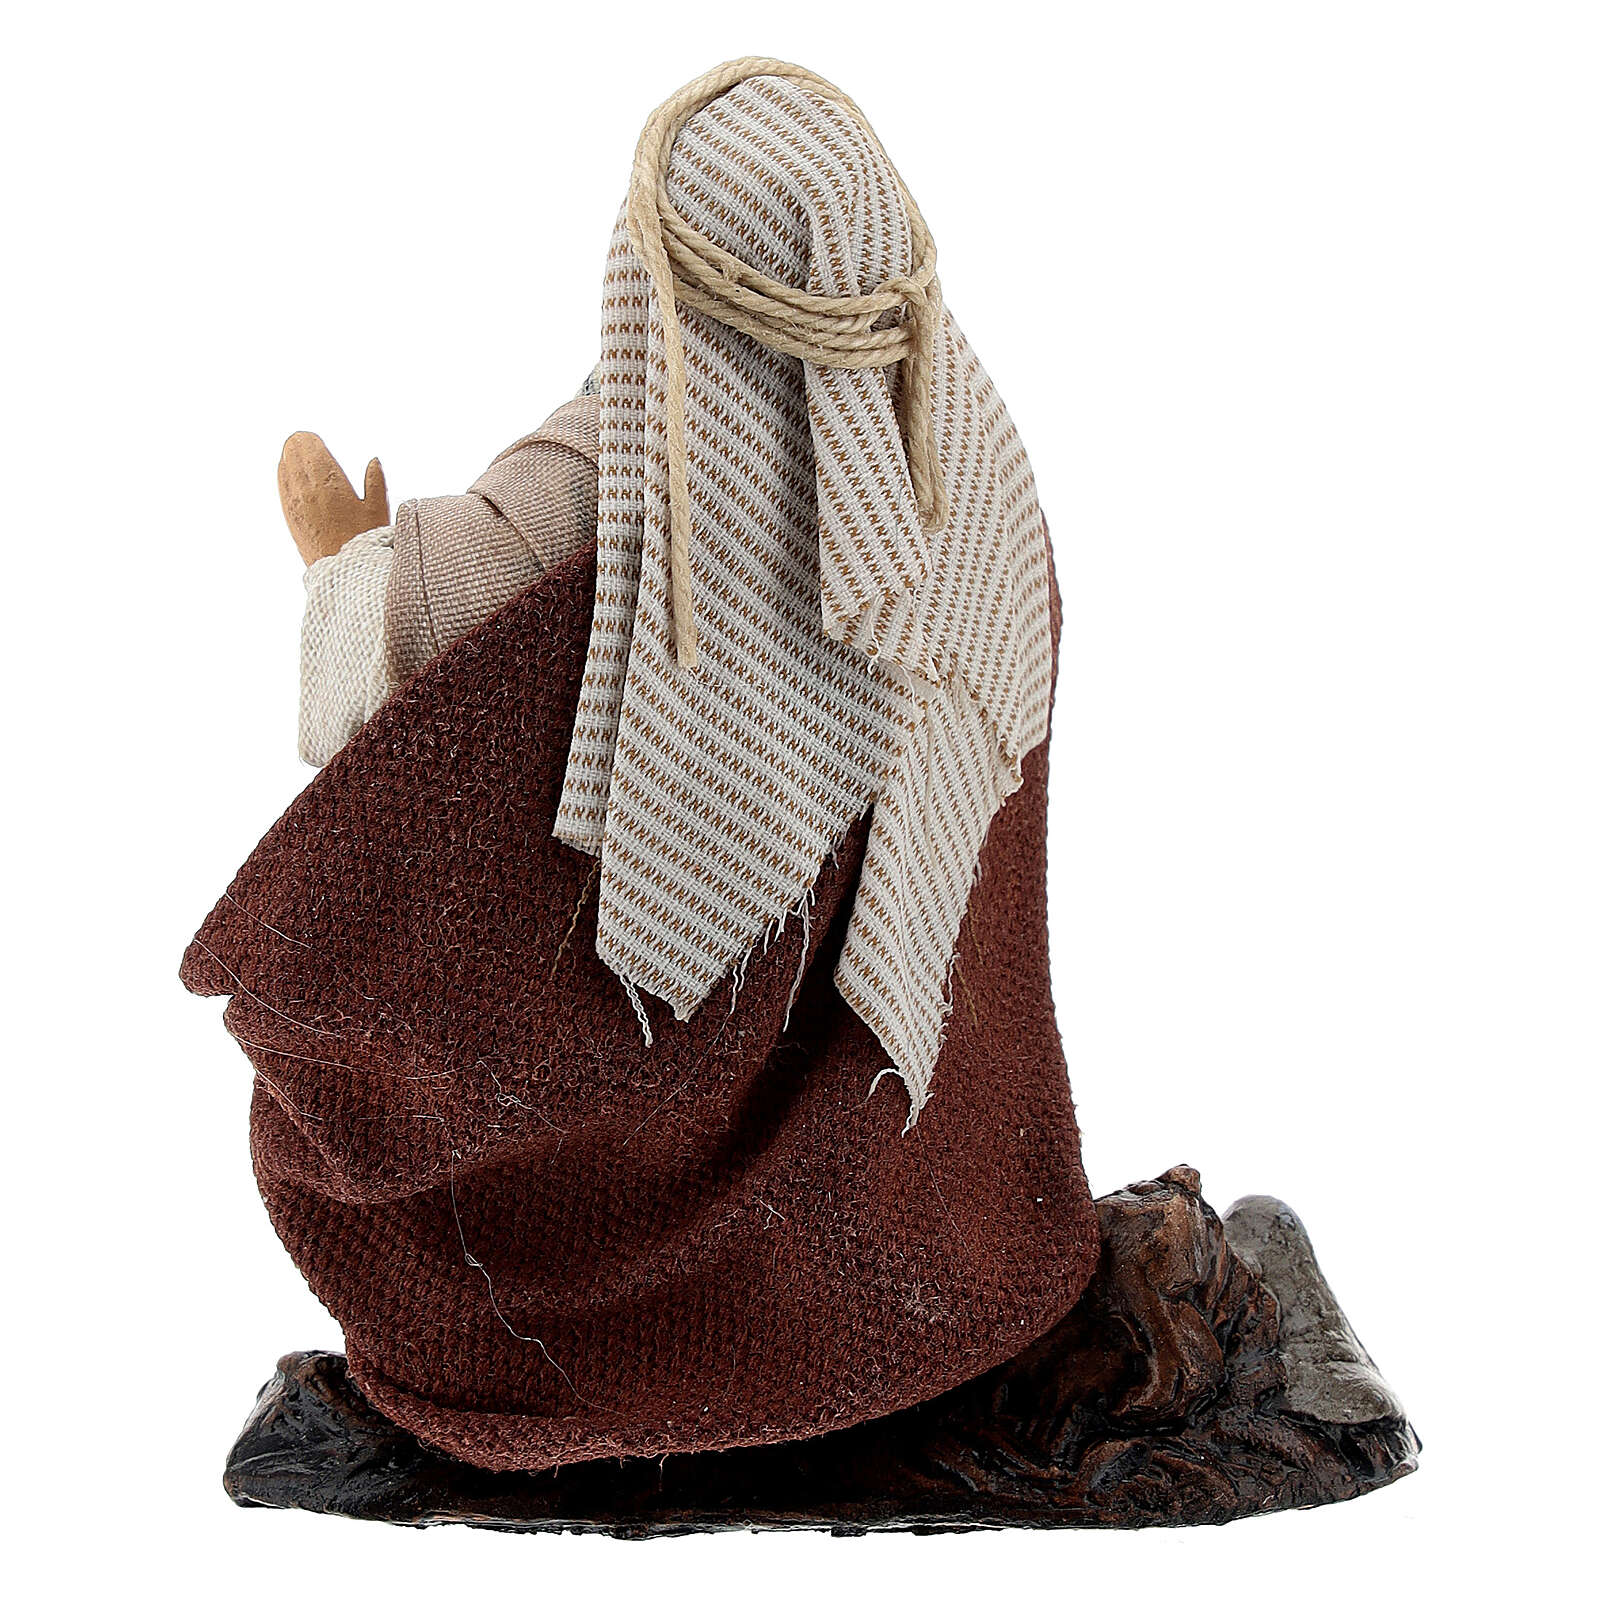 Lechero de rodillas 12 cm estatua terracota belén napolitano 4